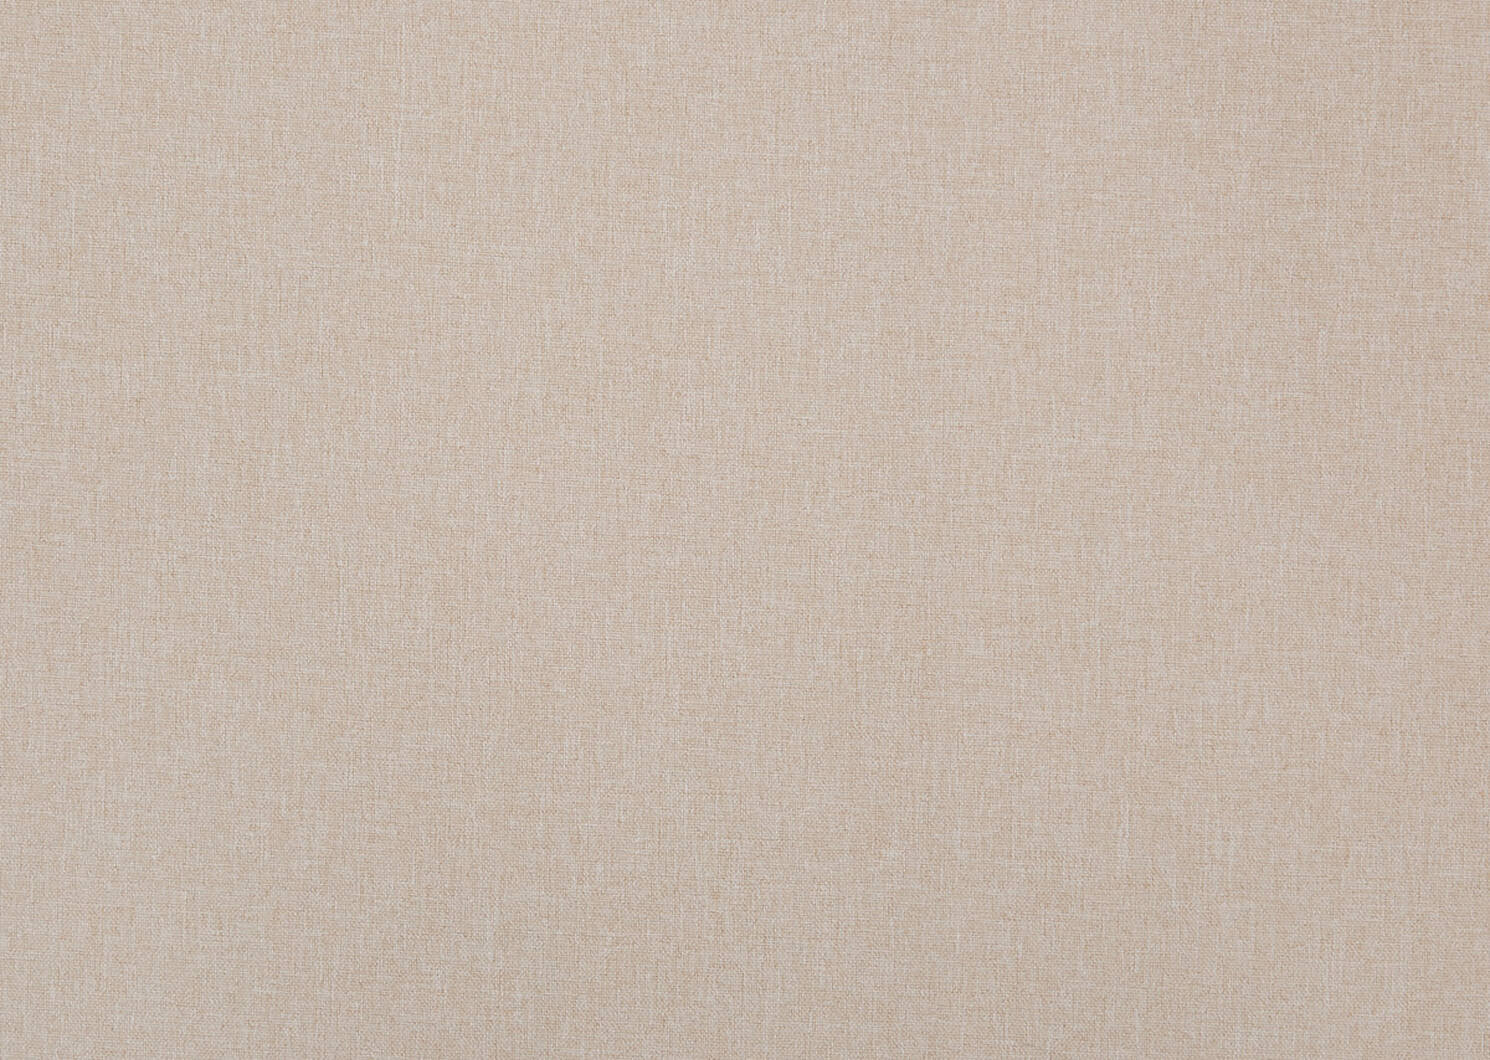 Varden Panel 96 Linen